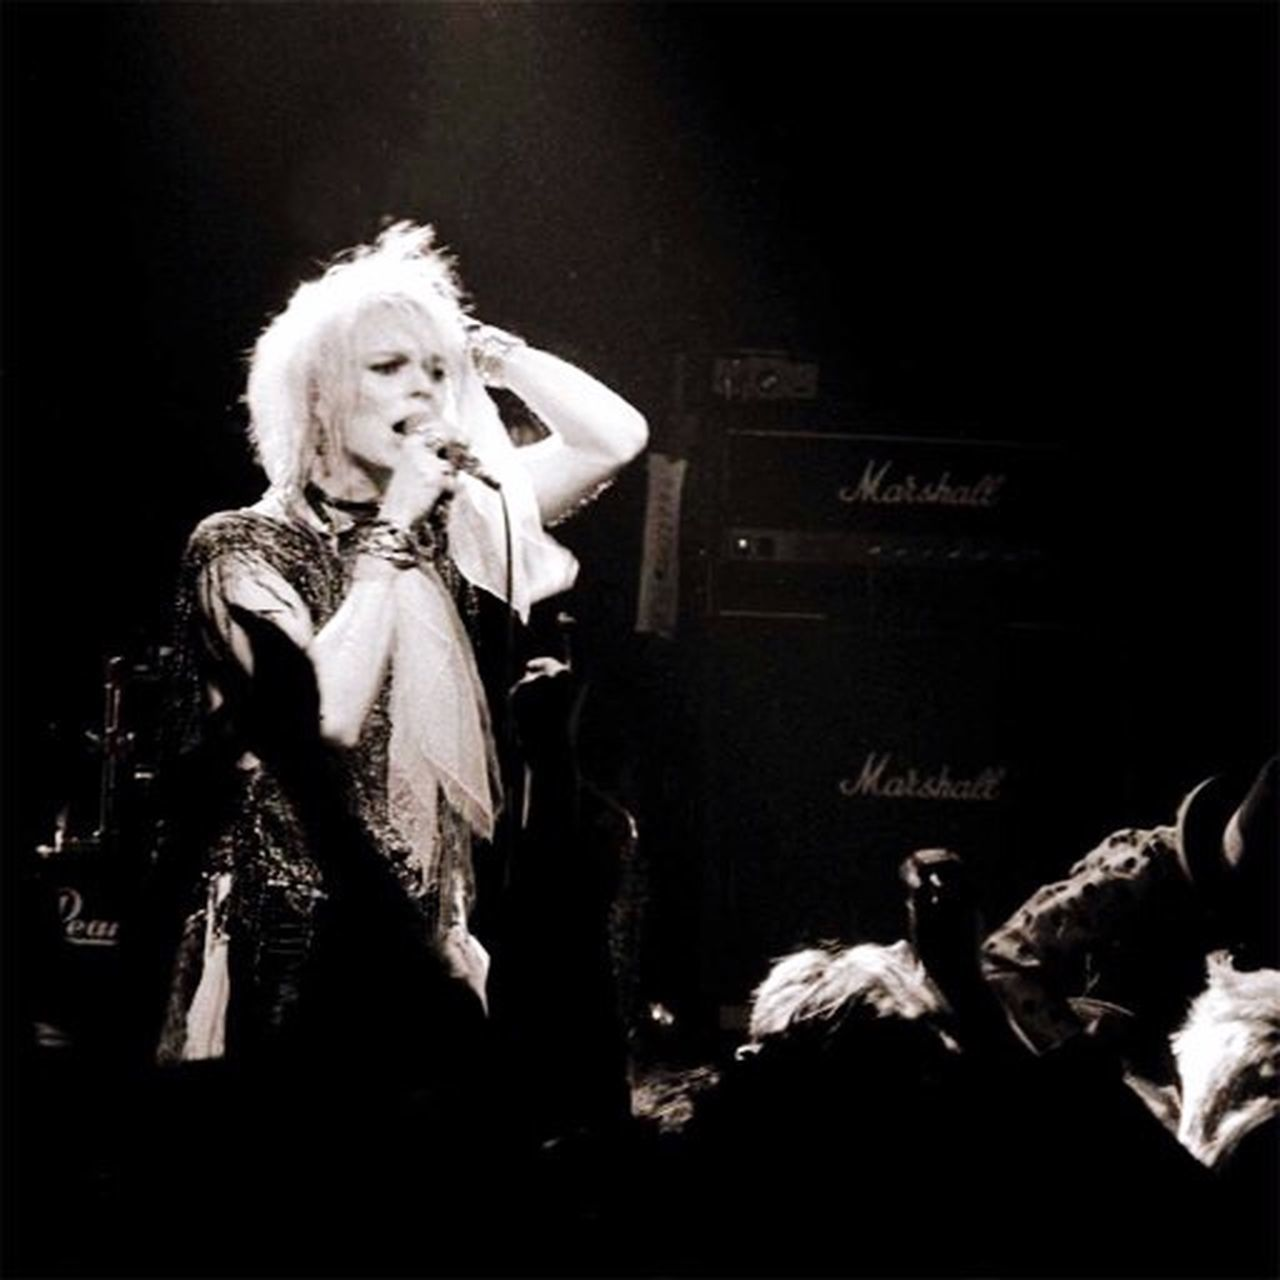 Mike Monroe Hanoi Rocks Ritz Bådde Bobadly Rock N Roll Black And White